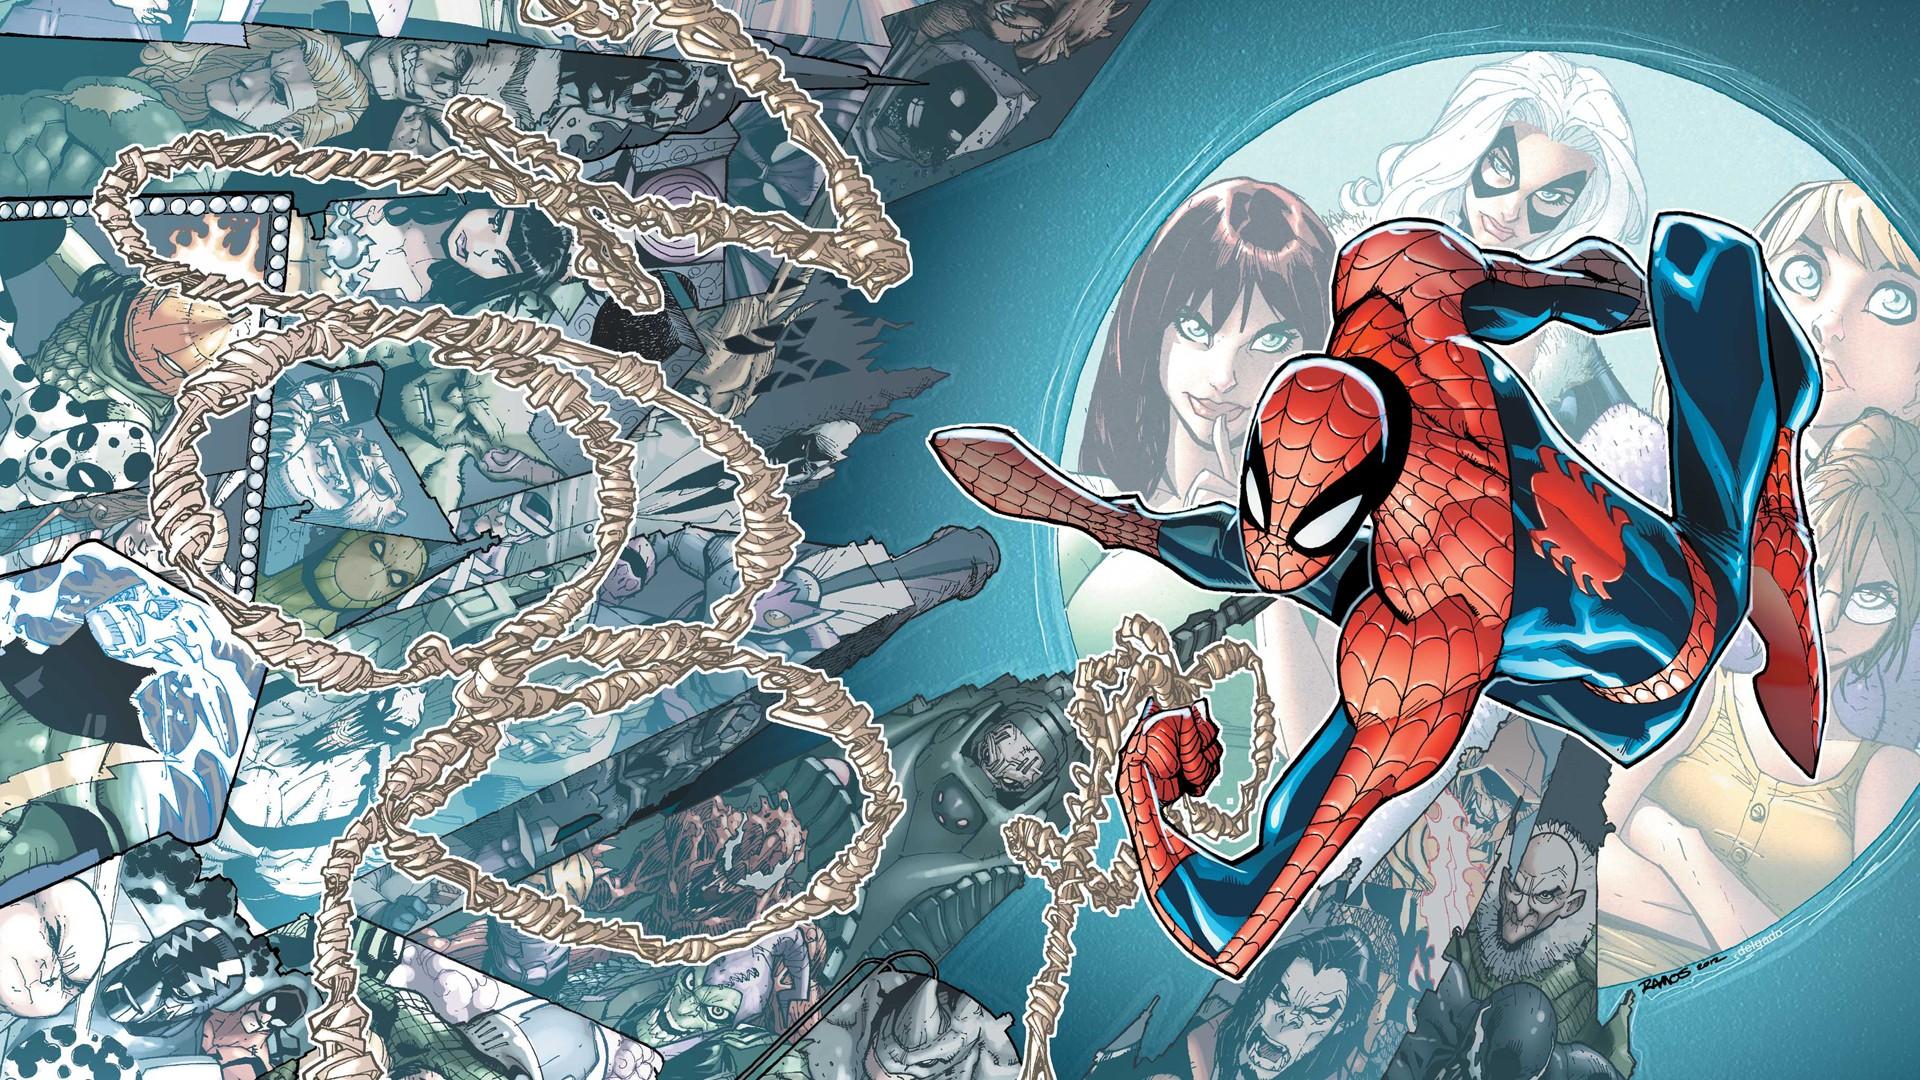 marvel comics wallpaper spider - photo #16